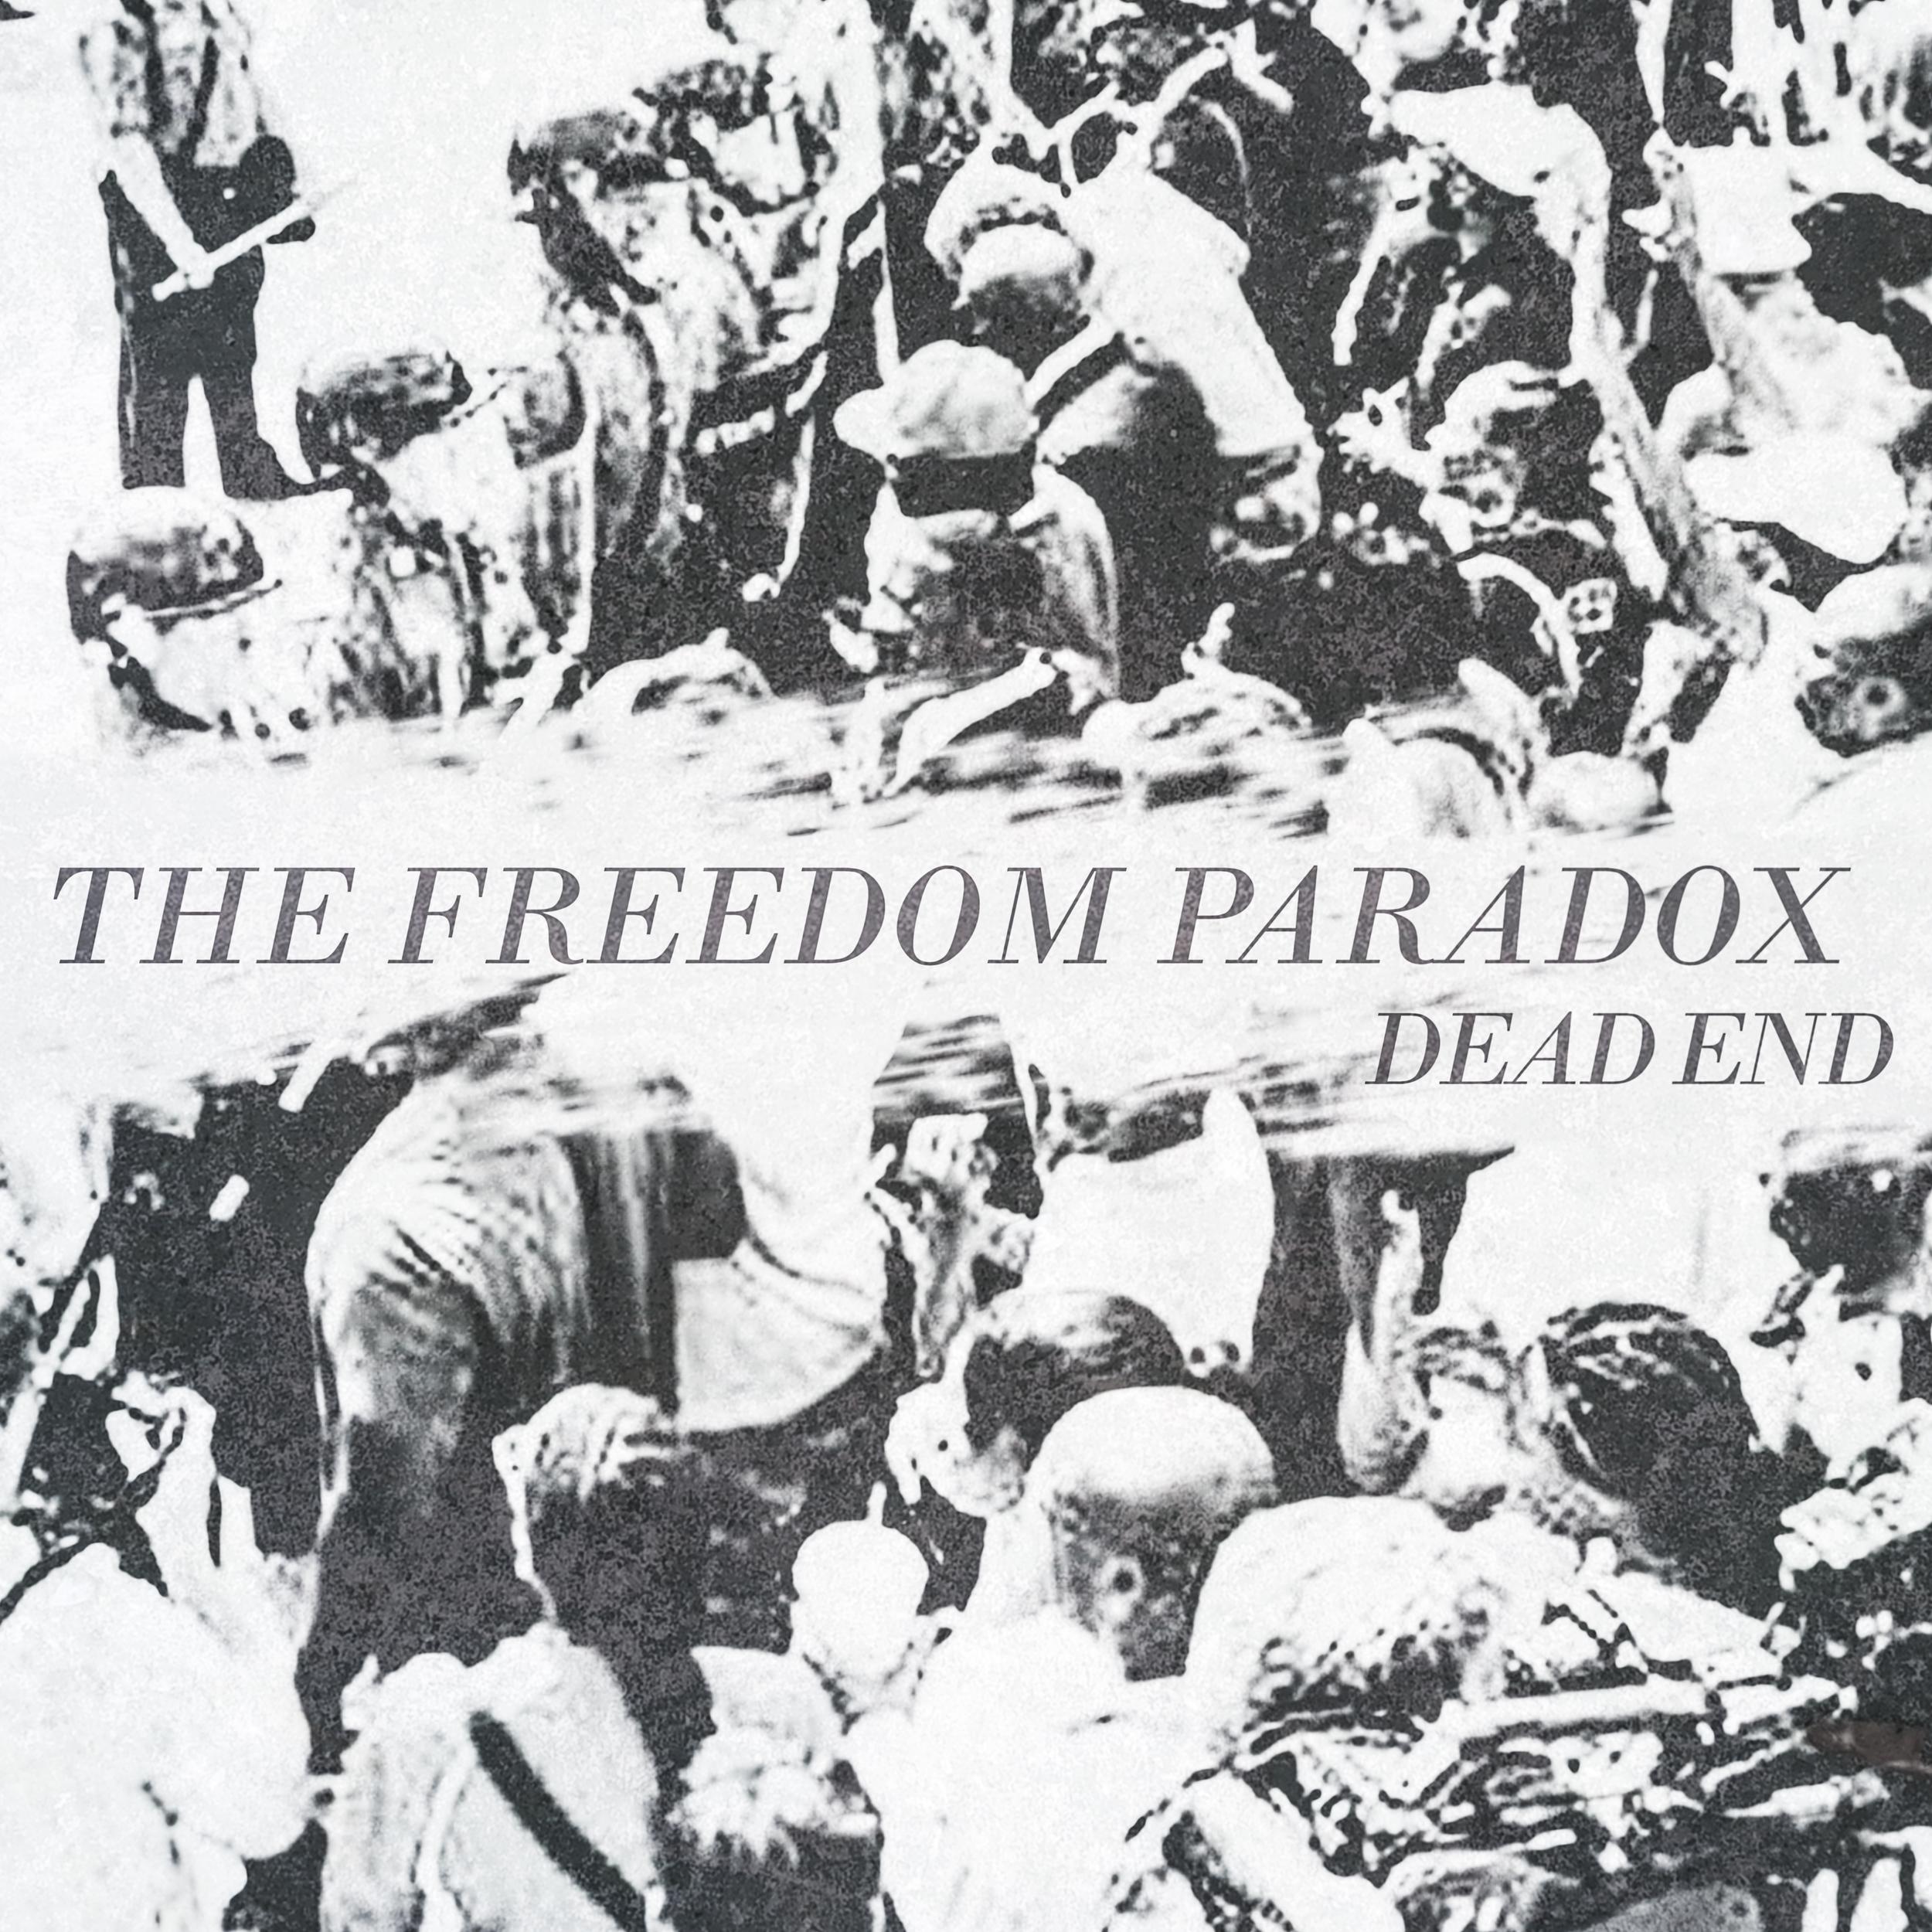 TheFreedomParadox-DeadEnd.jpg